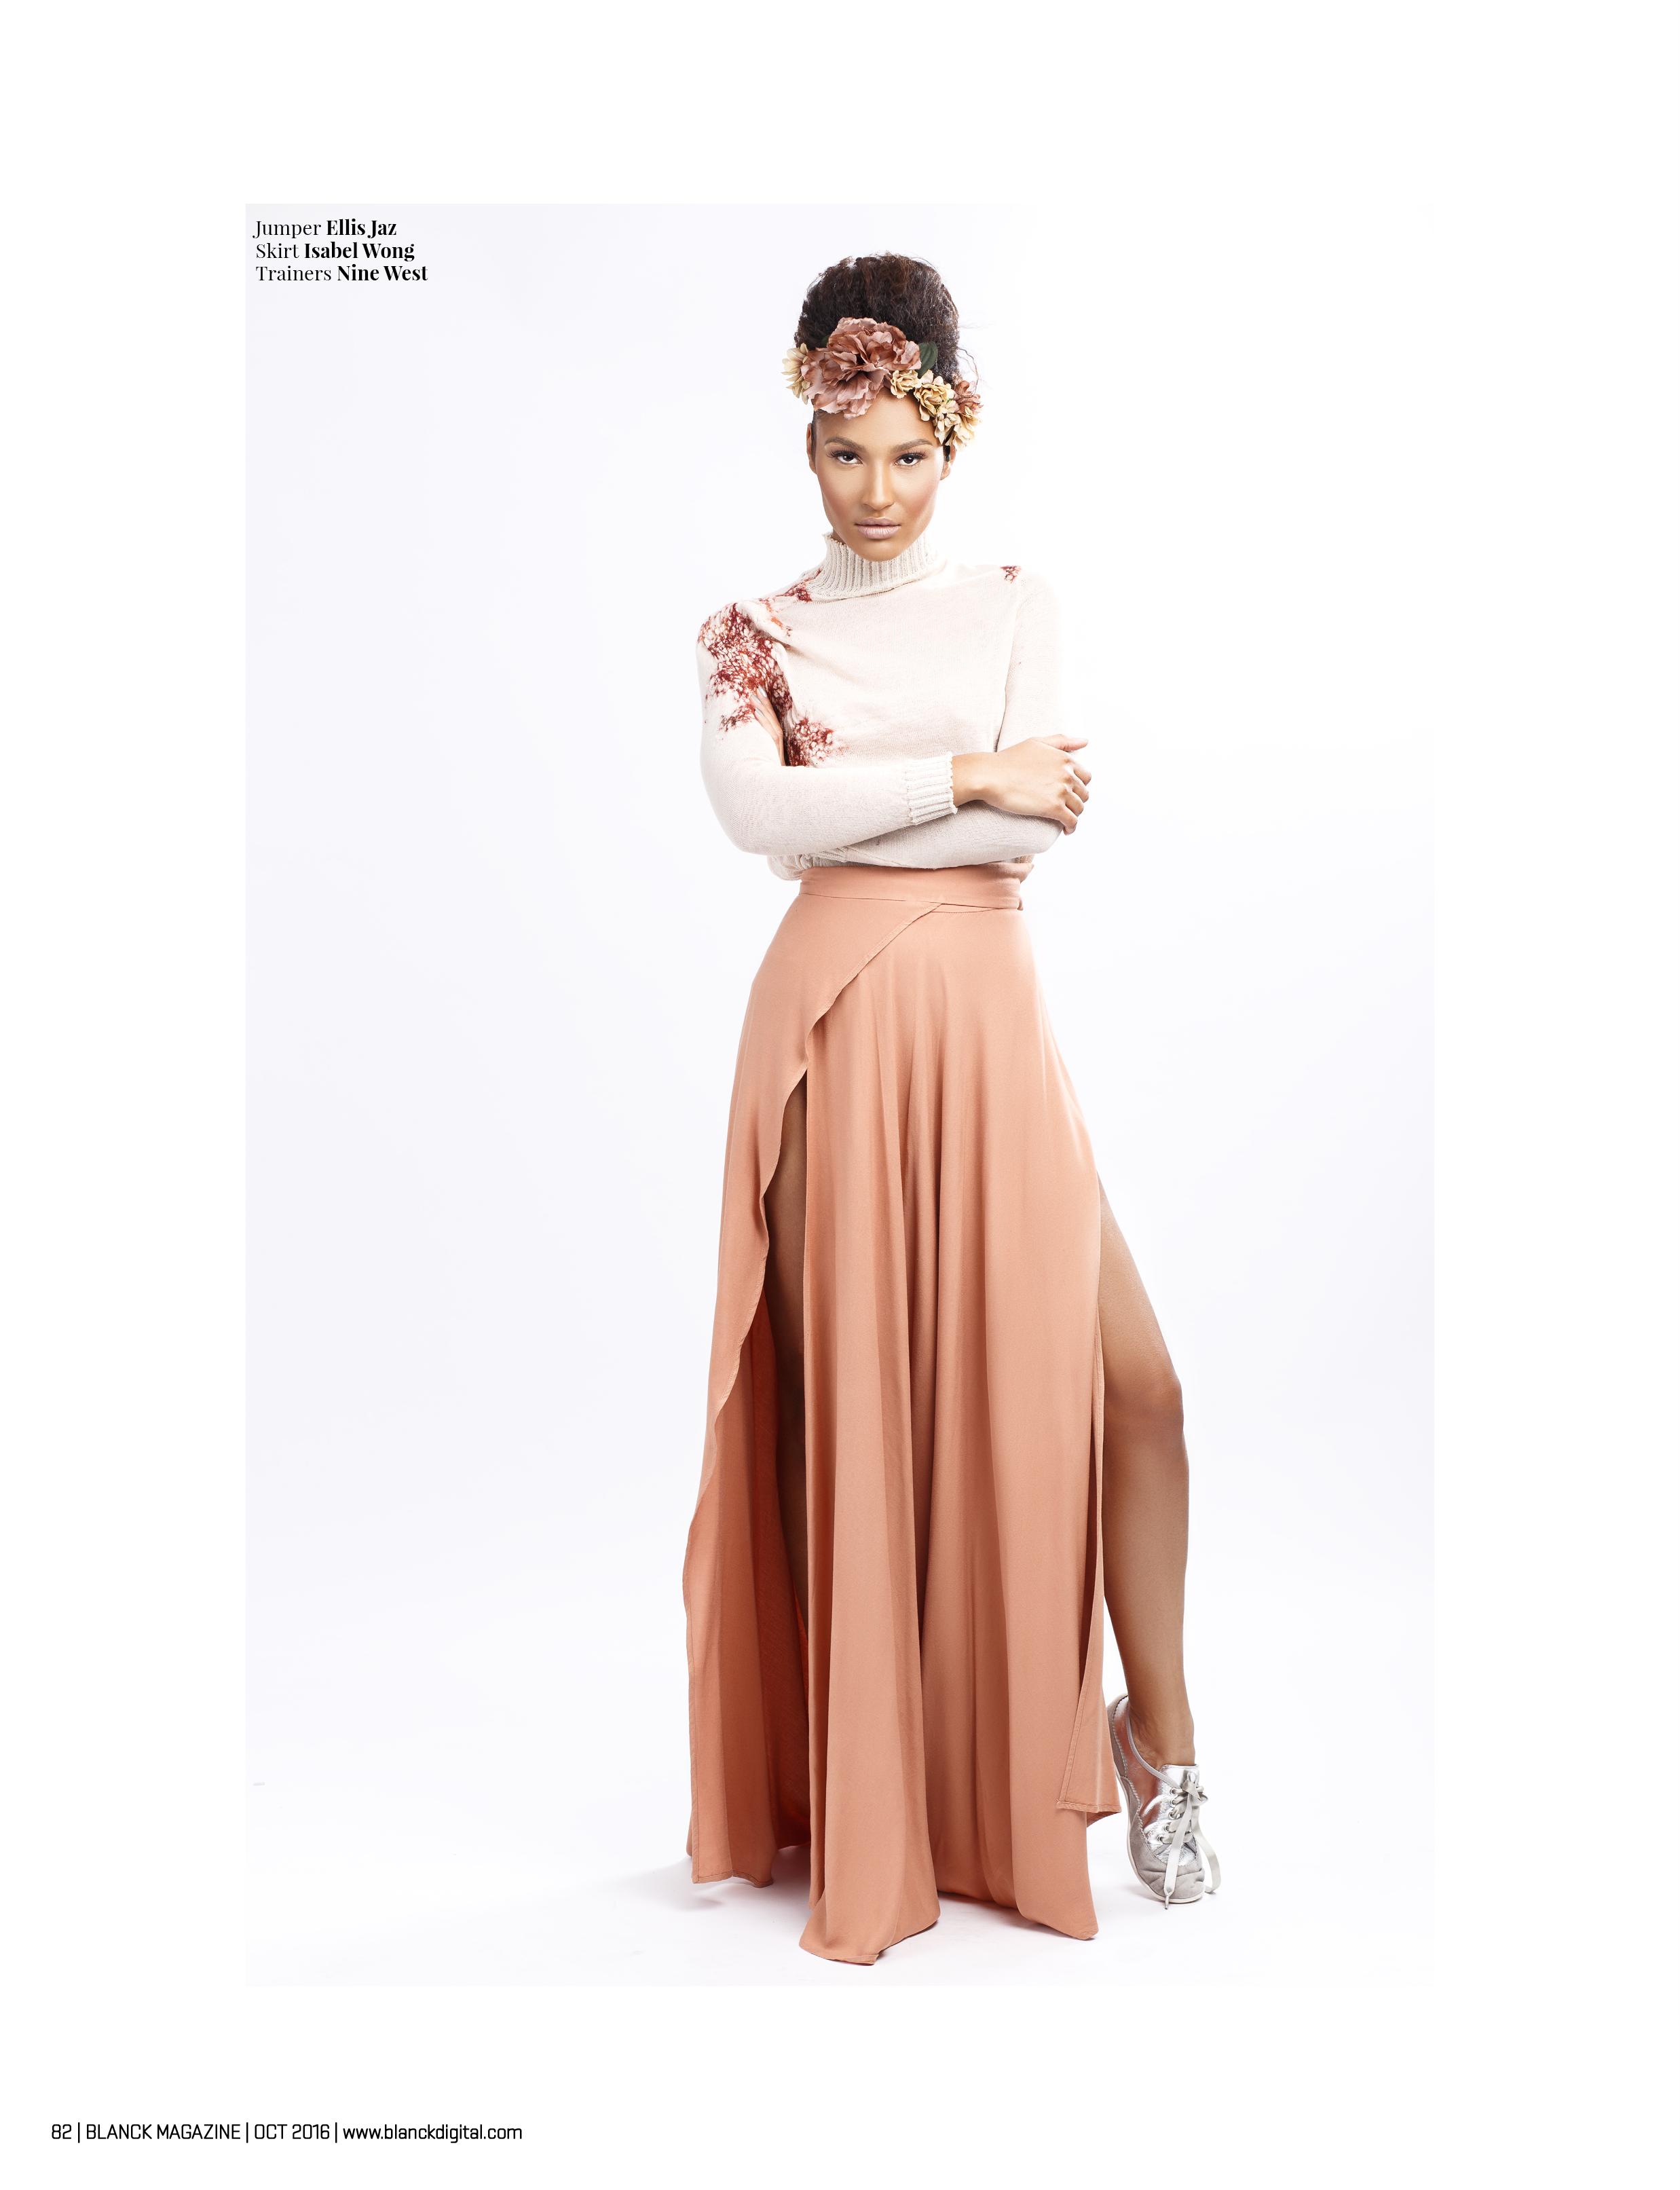 BLANCK Magazine Issue 8 82 Isabel Wong Maxi Skirt Split.png